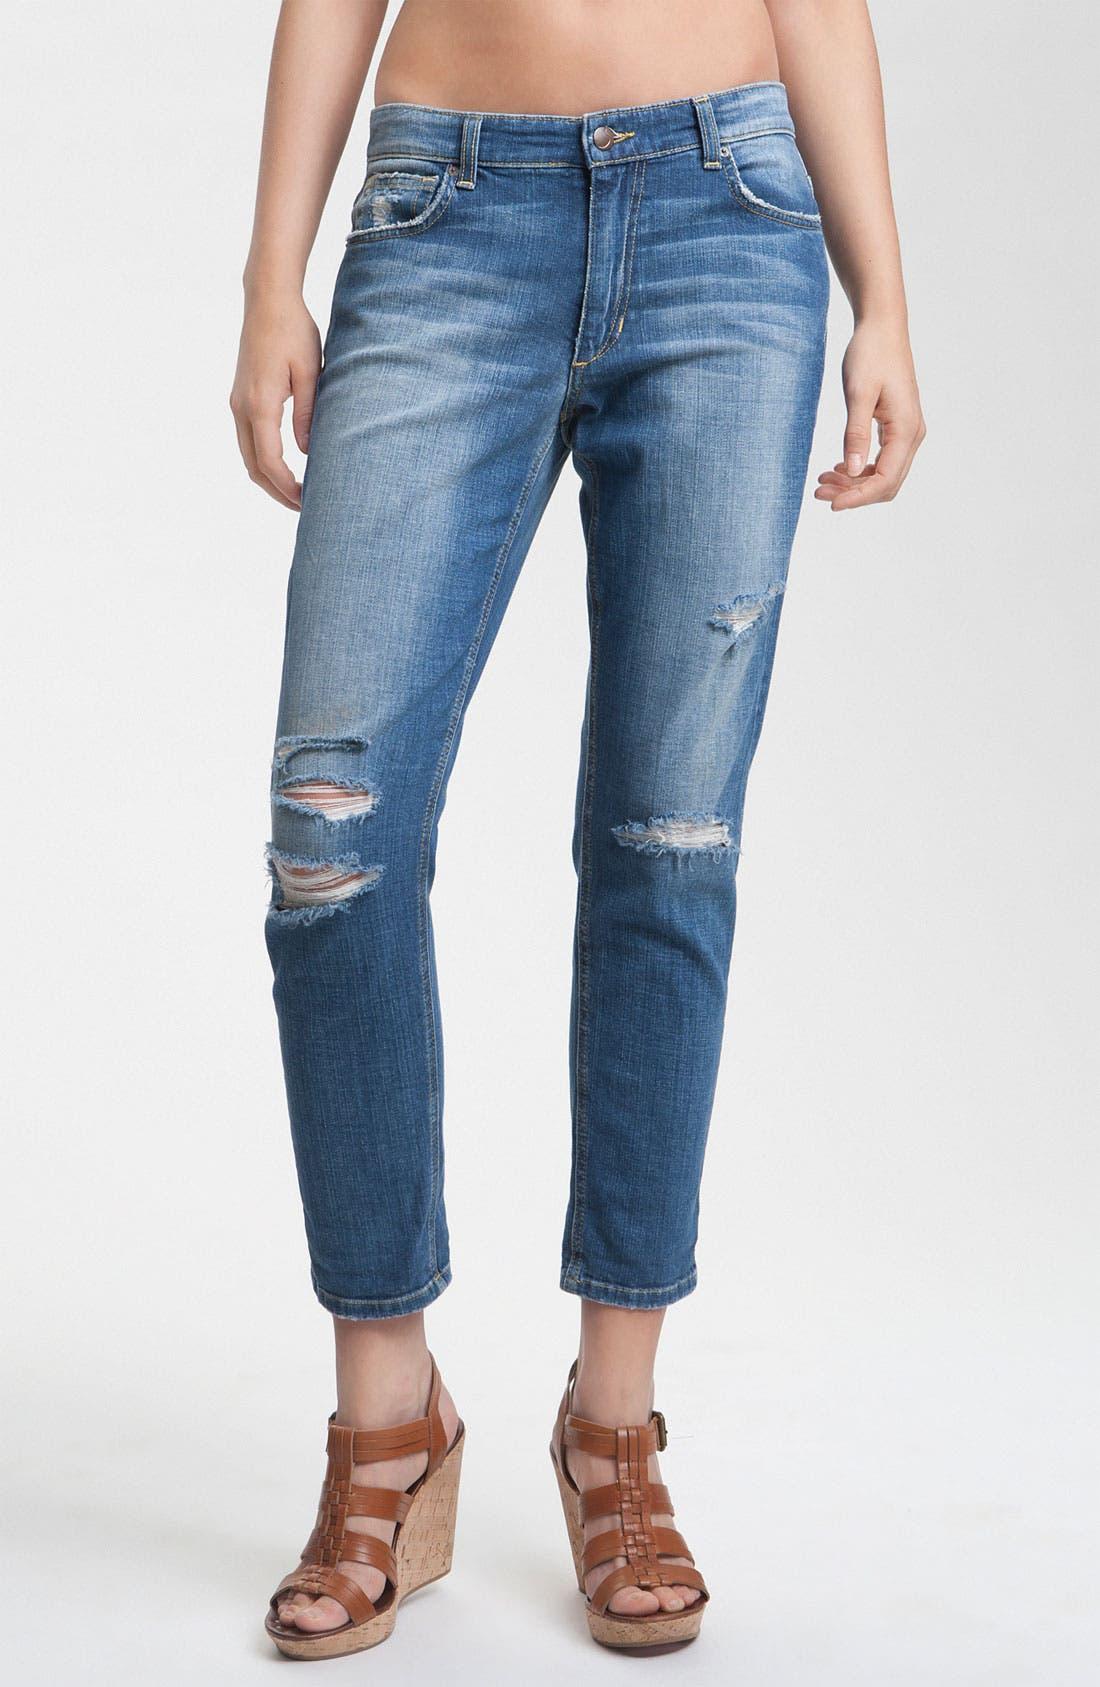 Alternate Image 1 Selected - Joe's 'Easy Fit' Destroyed Crop Jeans (Penelope)